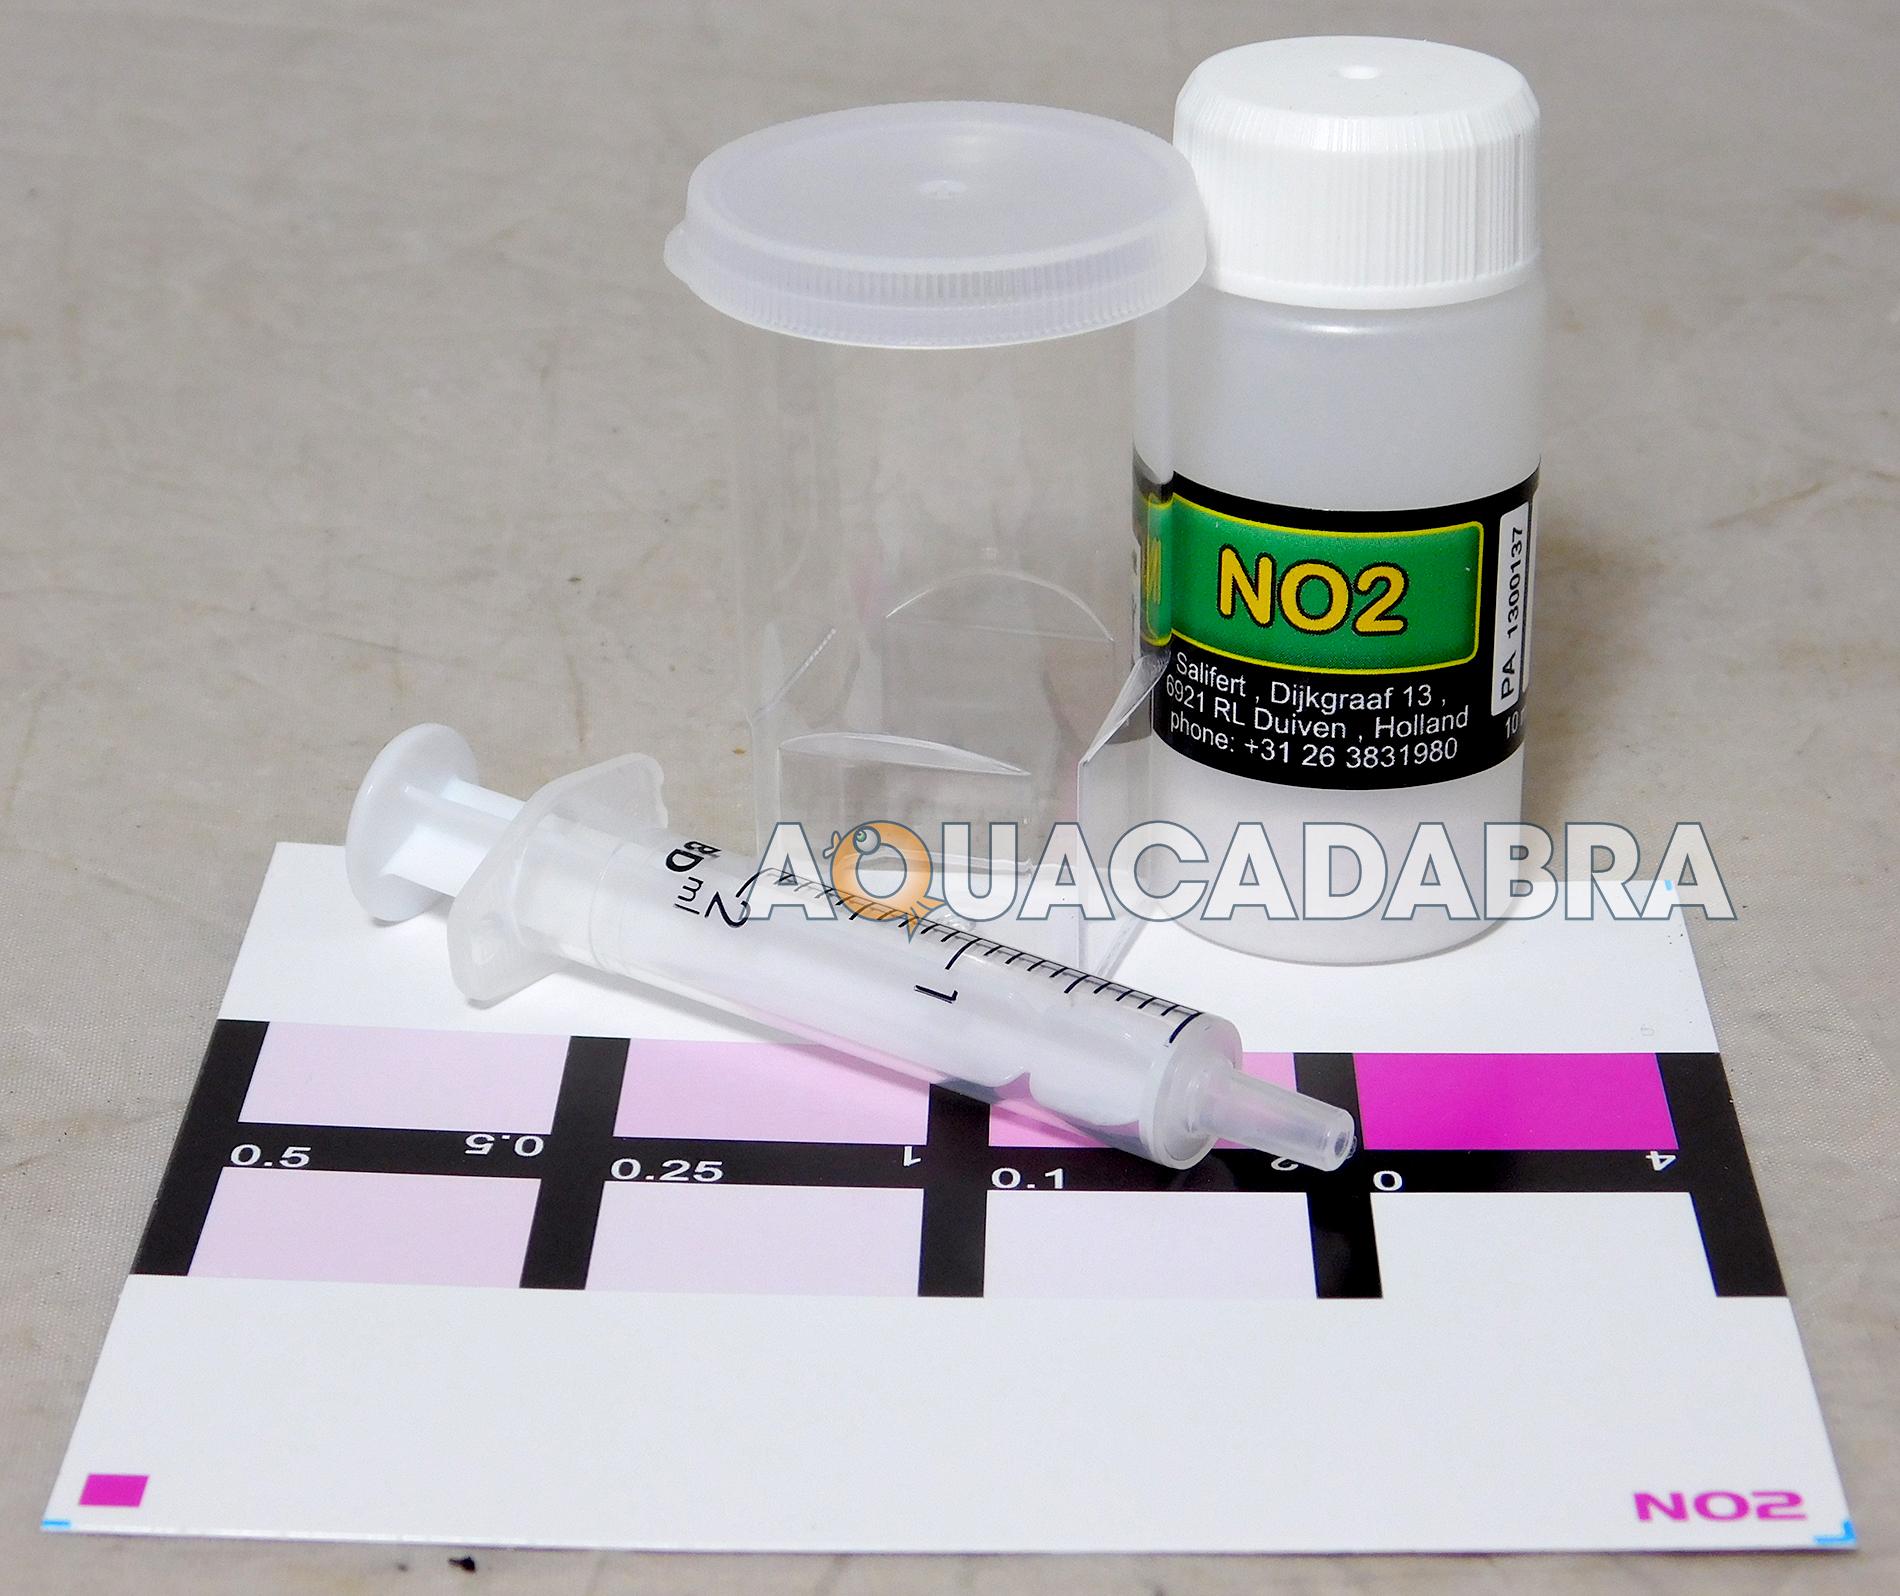 salifert nitrate test kit instructions